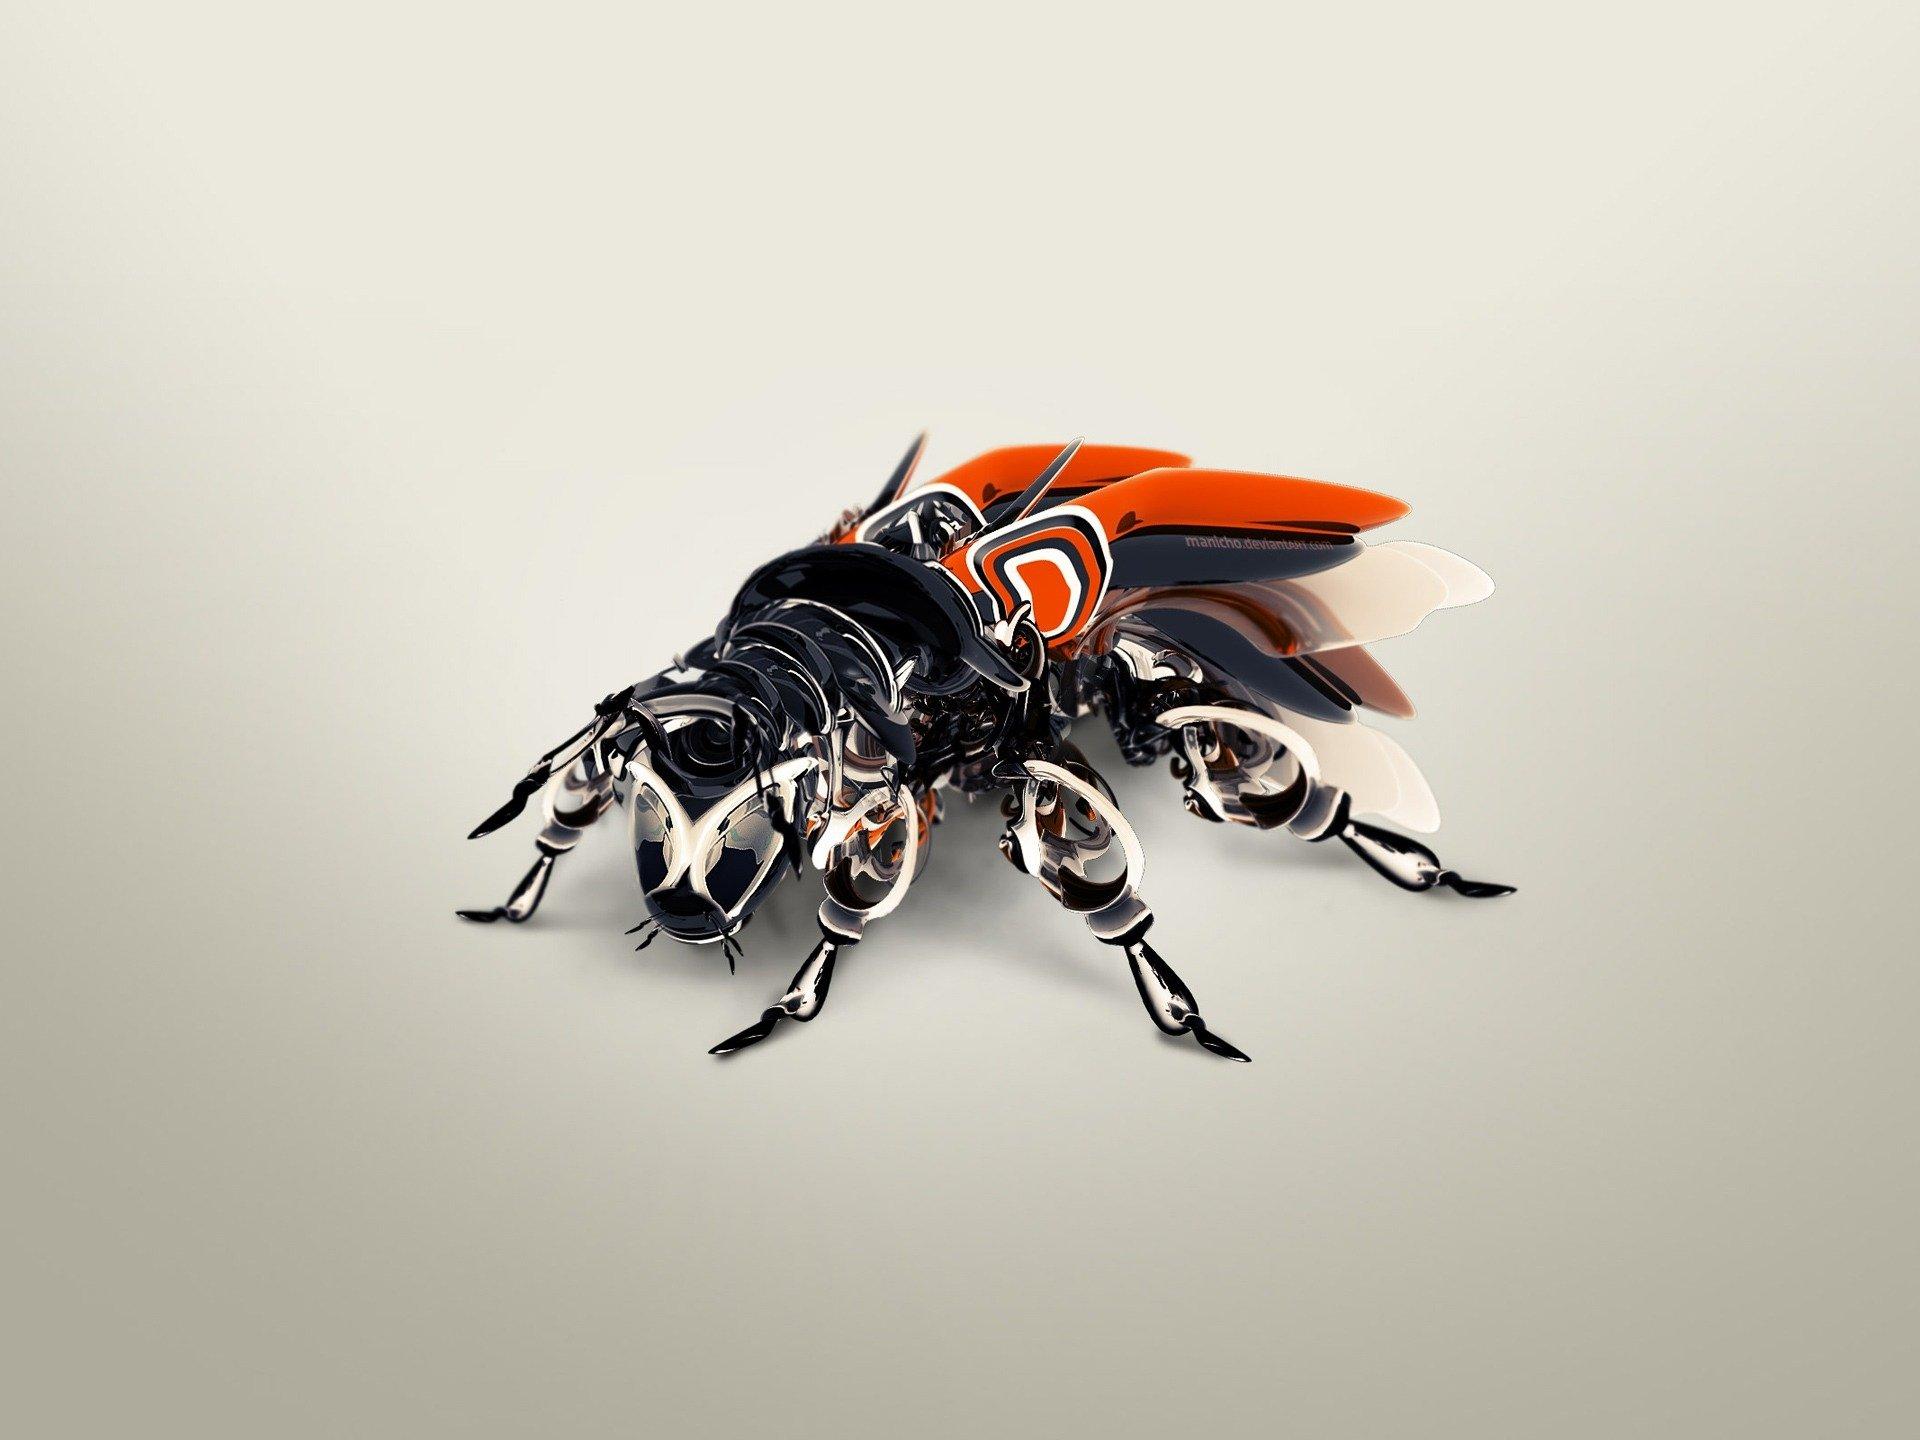 CGI - Other  Fly Bug CGI Wallpaper